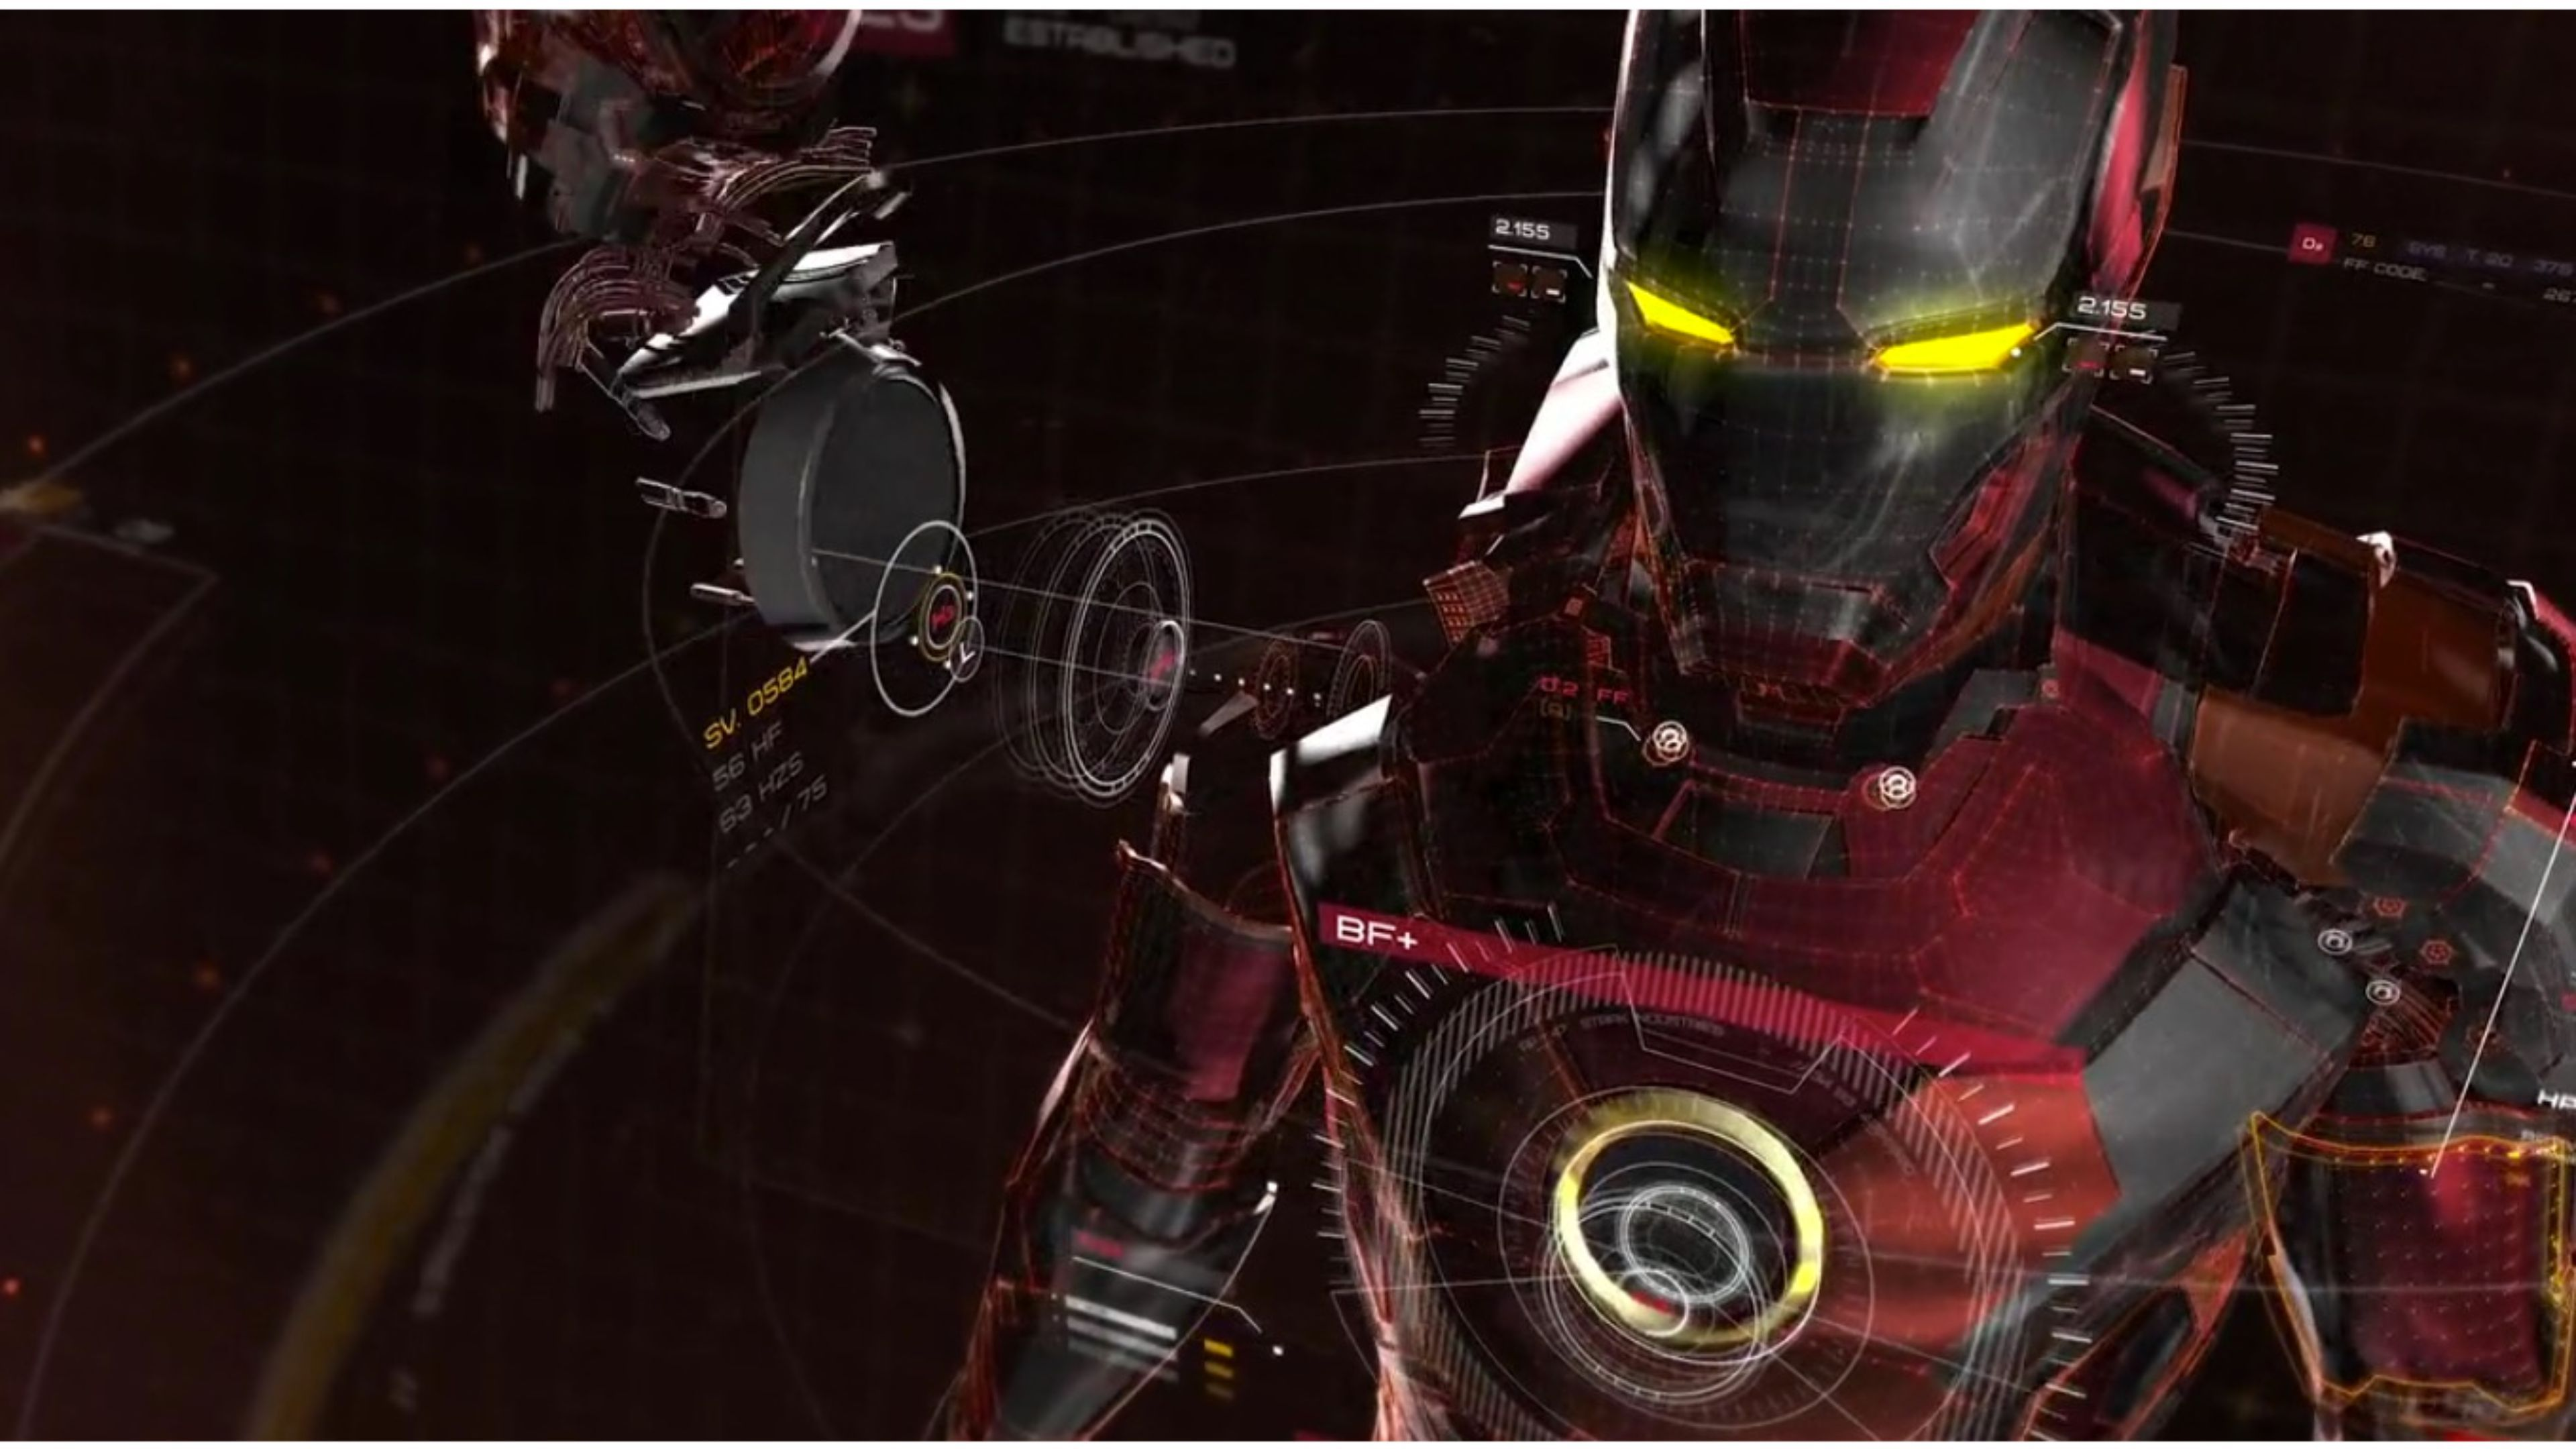 Iron Man Hd Wallpapers Backgrounds Wallpaper Iron Man Wallpaper Iron Man Hd Wallpaper Avengers Age